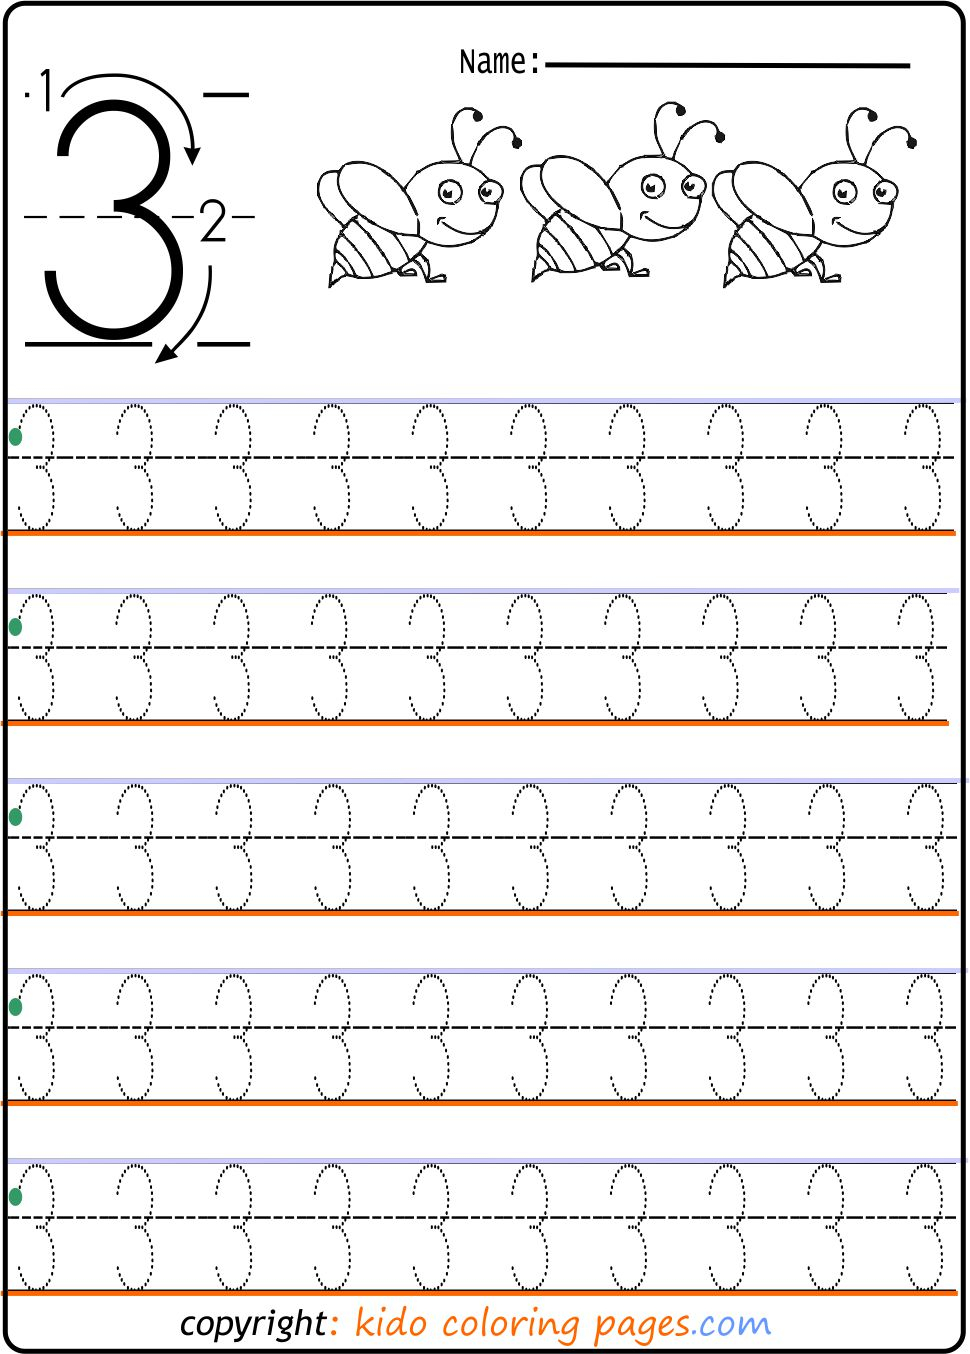 Worksheet ~ Kindergarten Tracing Worksheets Picture Ideas